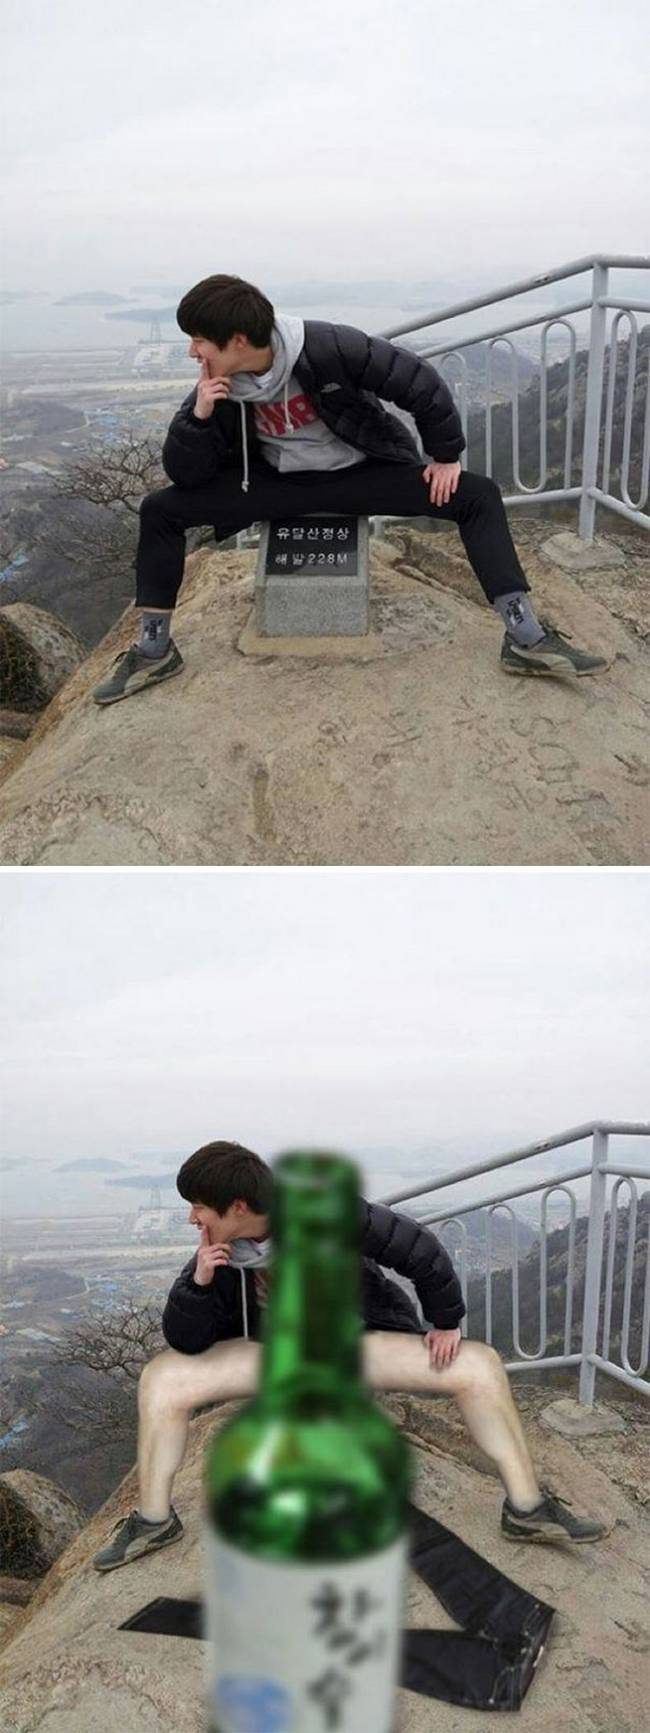 Photoshop fails (12)